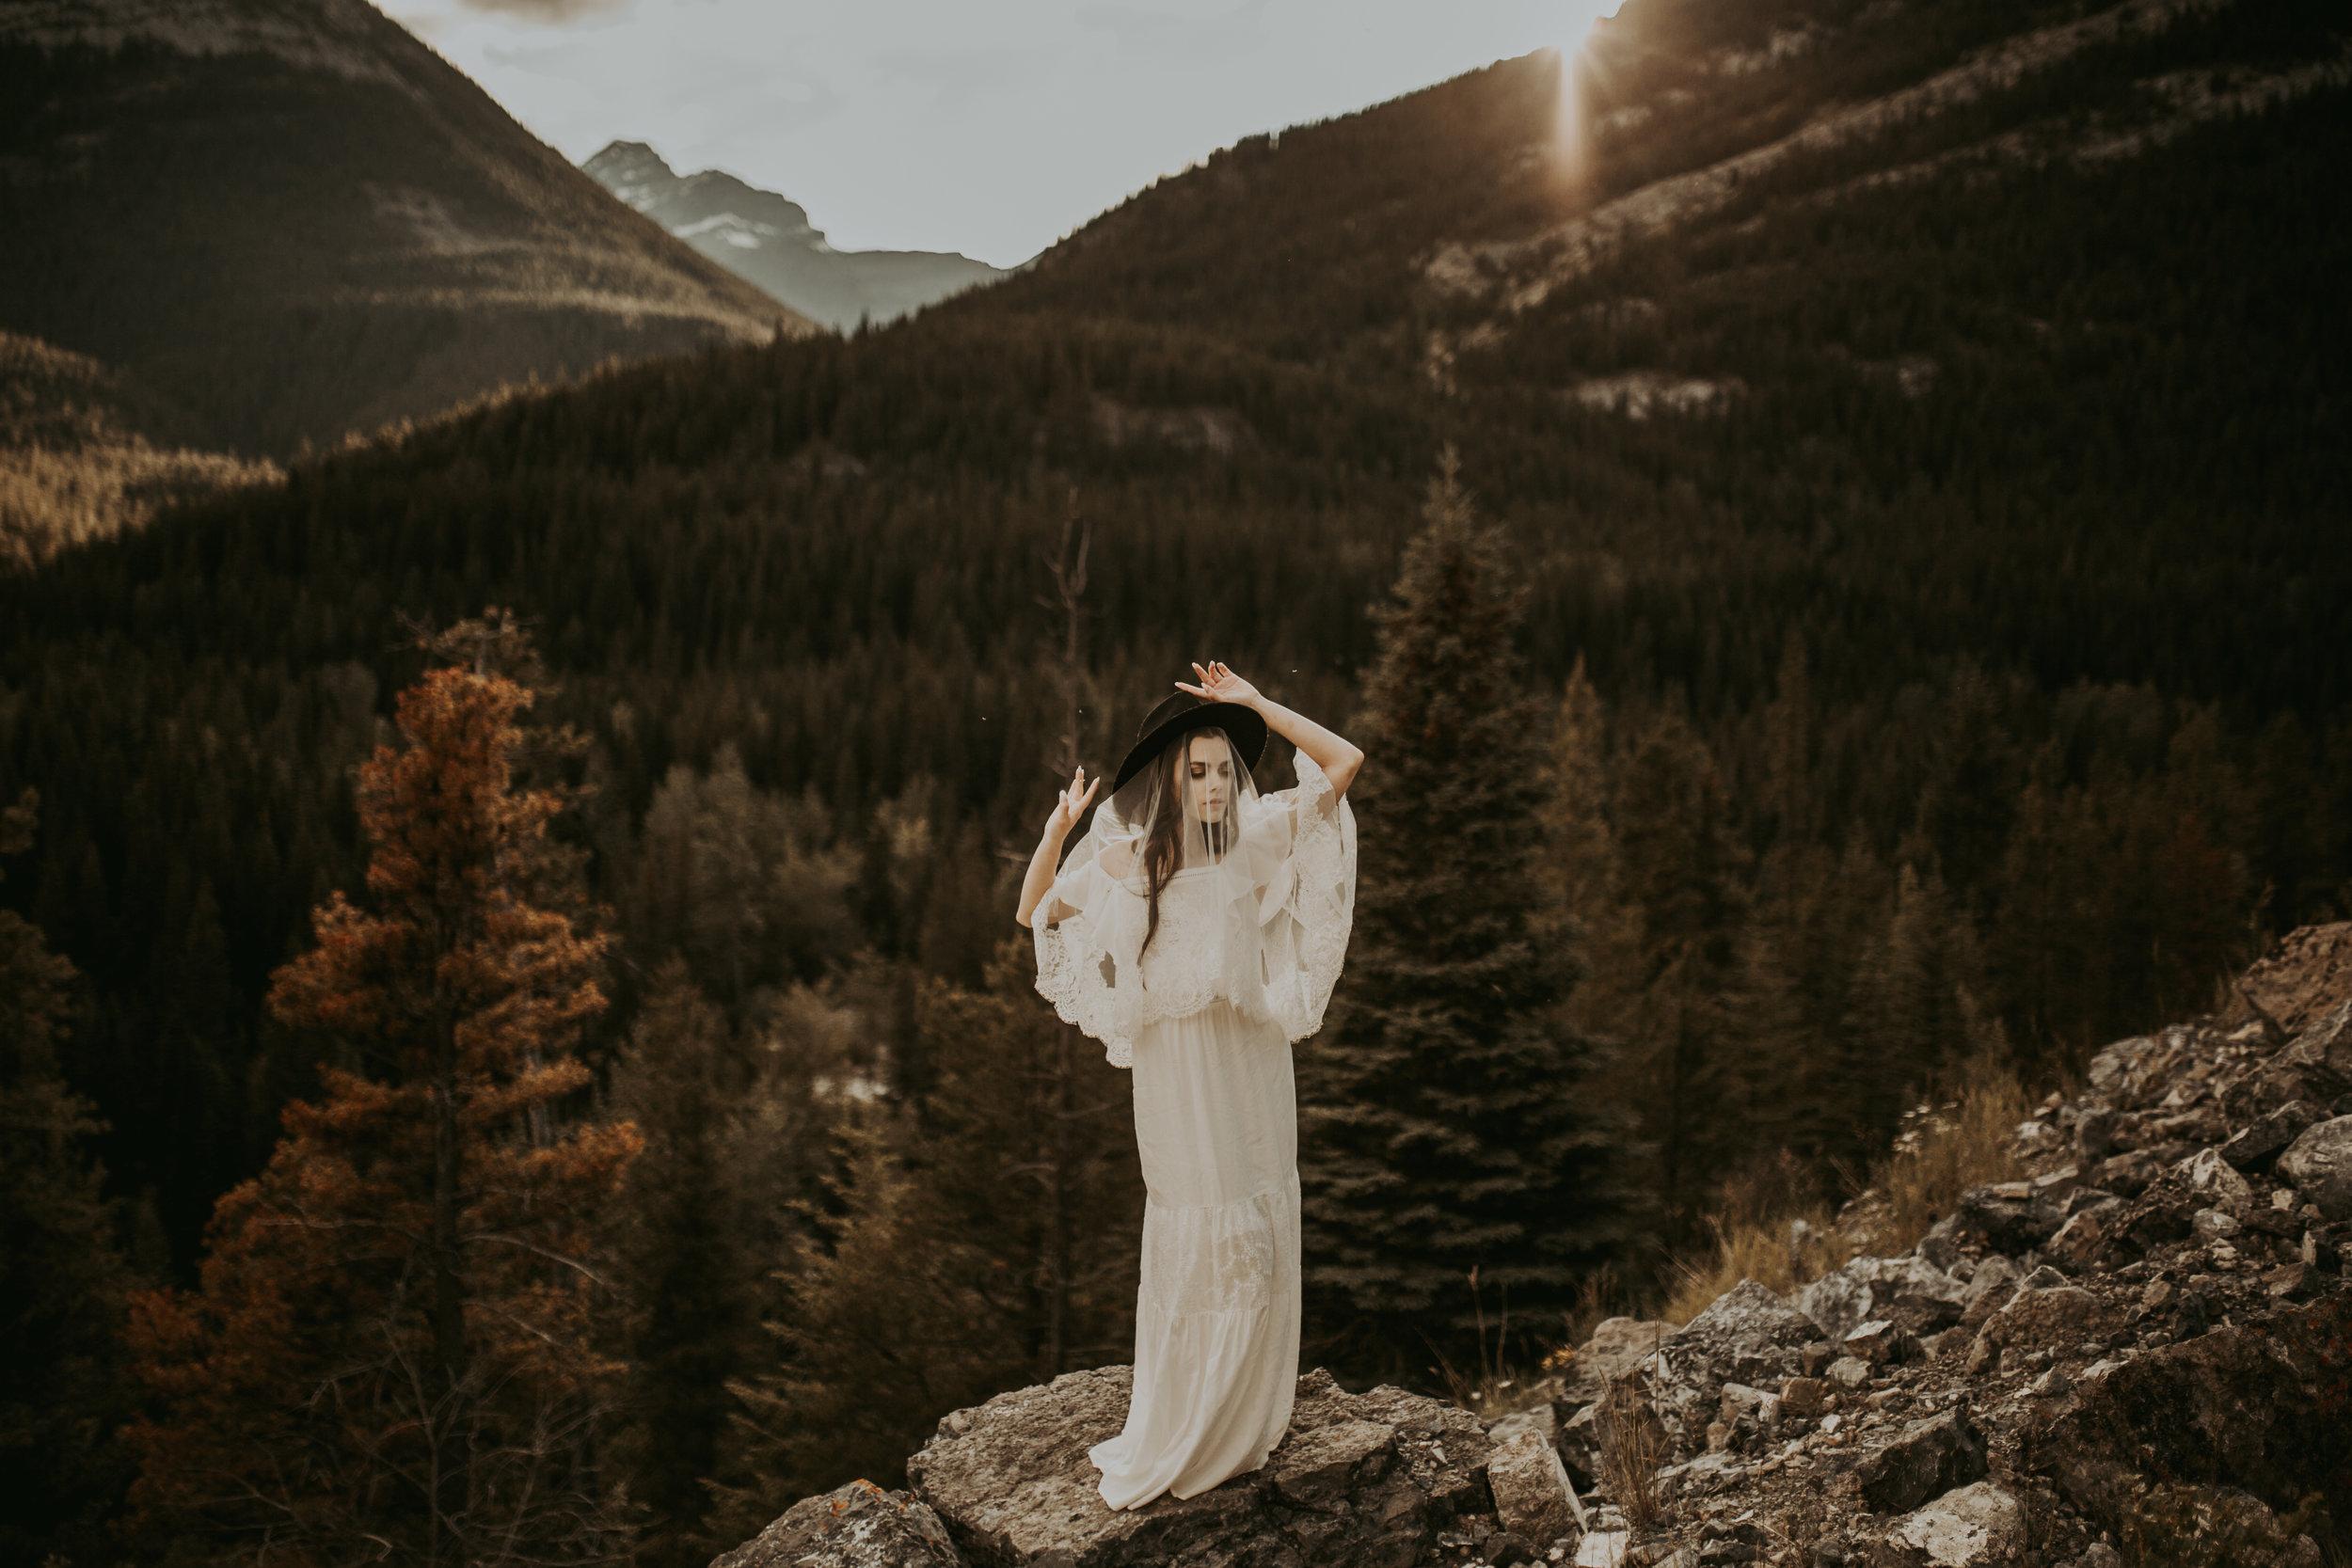 Emerald Lake Elopement, Emerald Lake Lodge Photographer, Banff Elopement Photographer, Banff Photographer, Banff Elopement